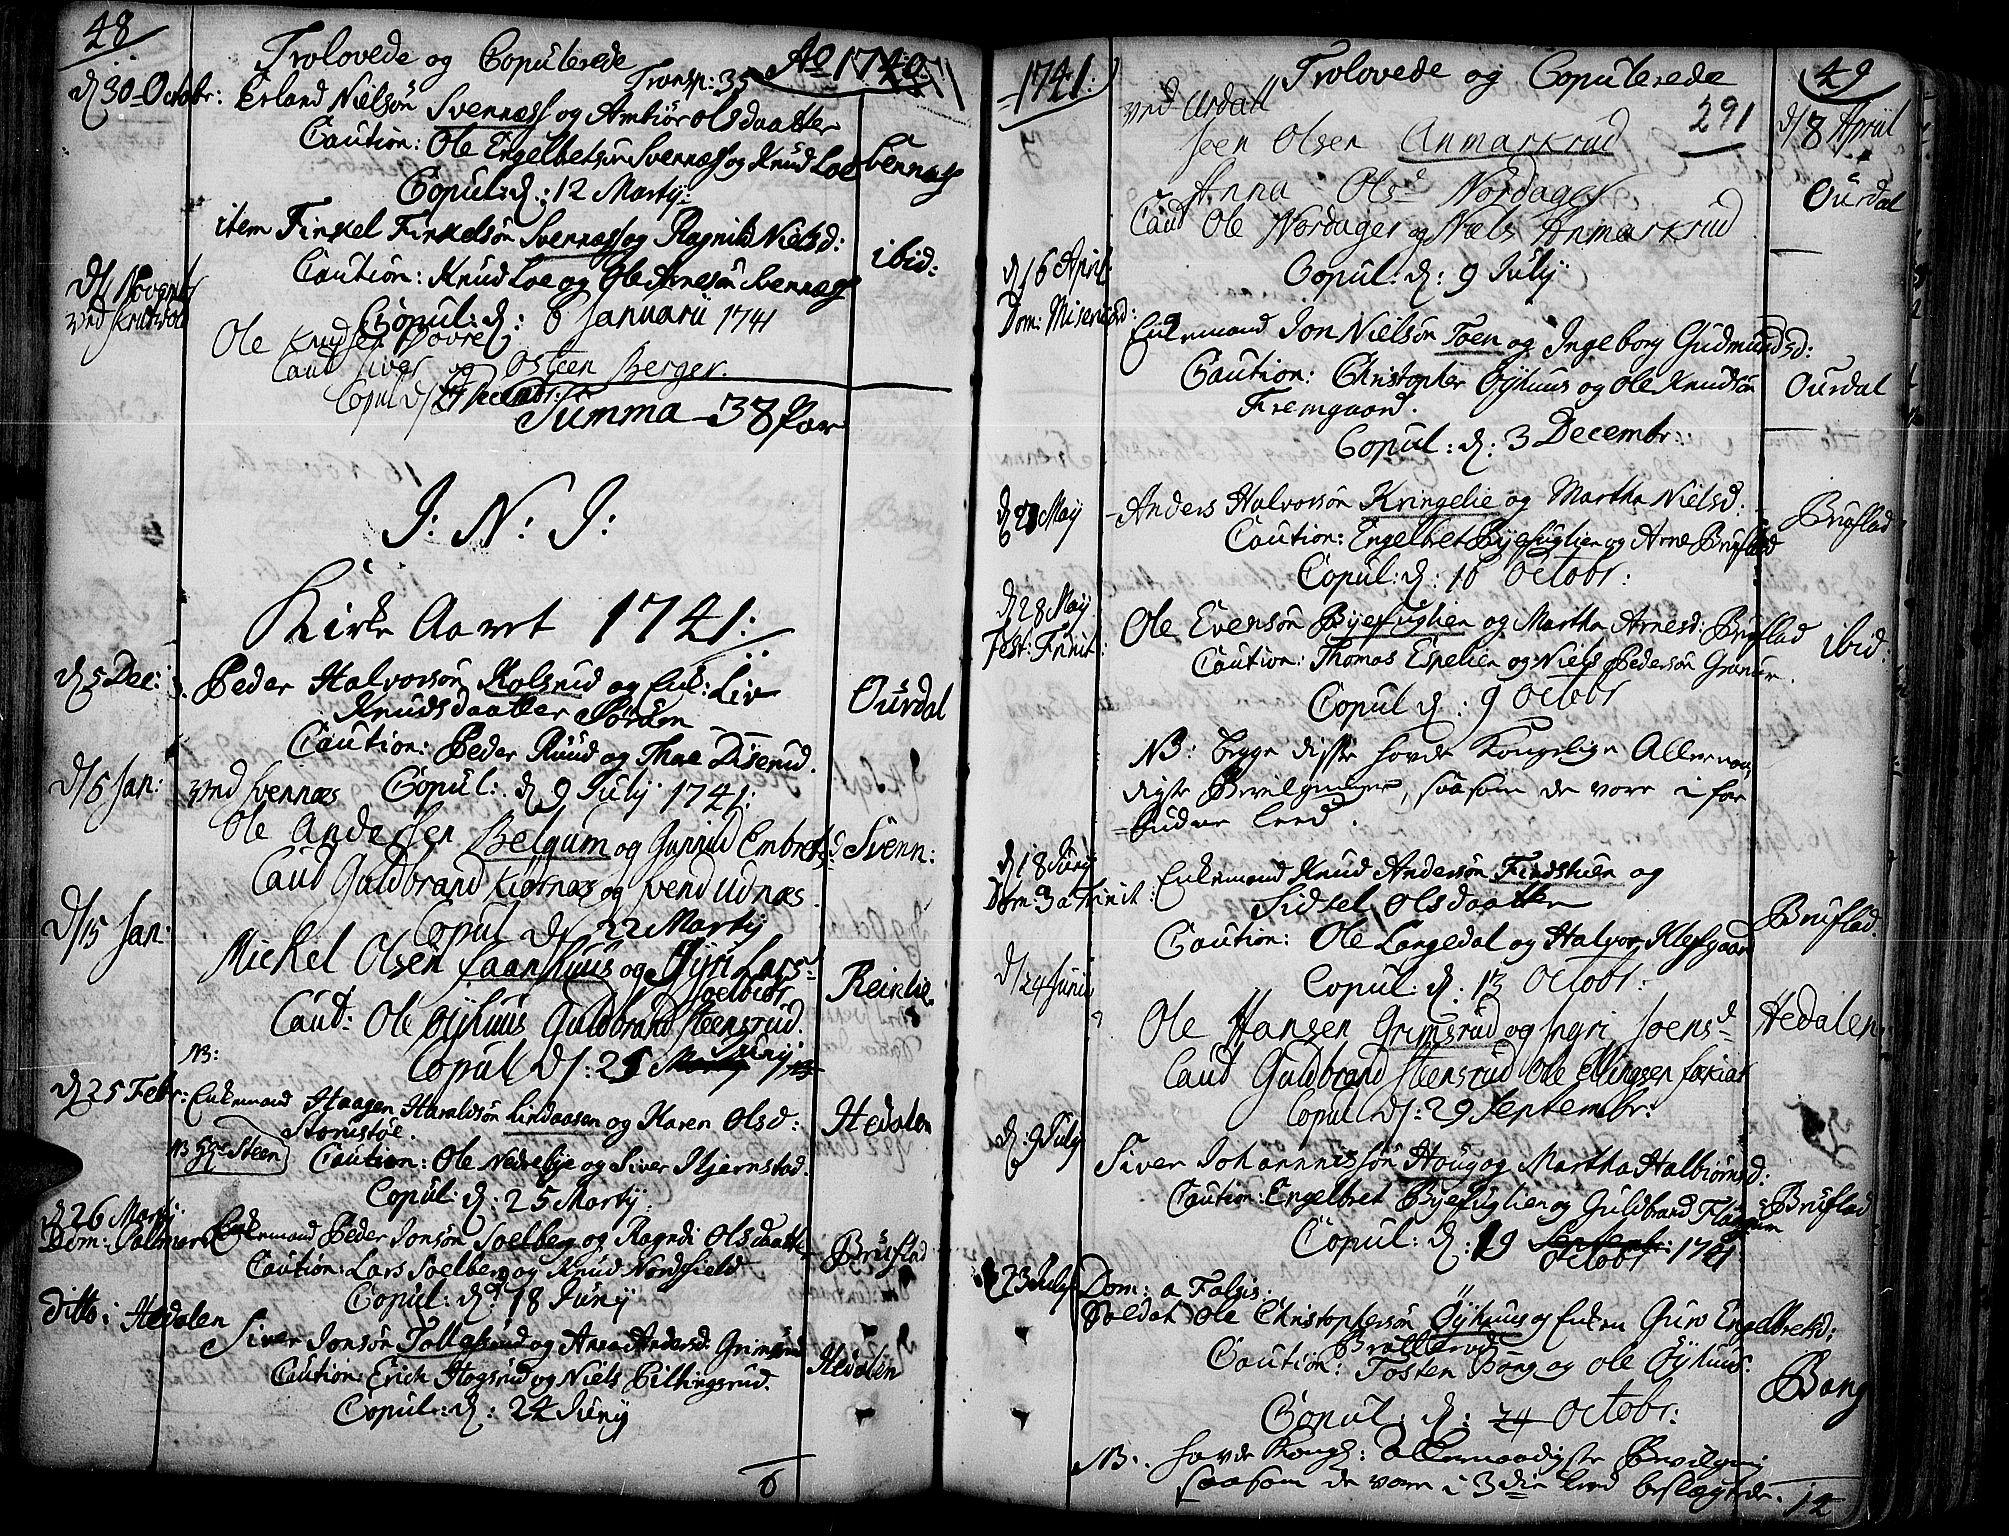 SAH, Aurdal prestekontor, Ministerialbok nr. 4, 1730-1762, s. 48-49